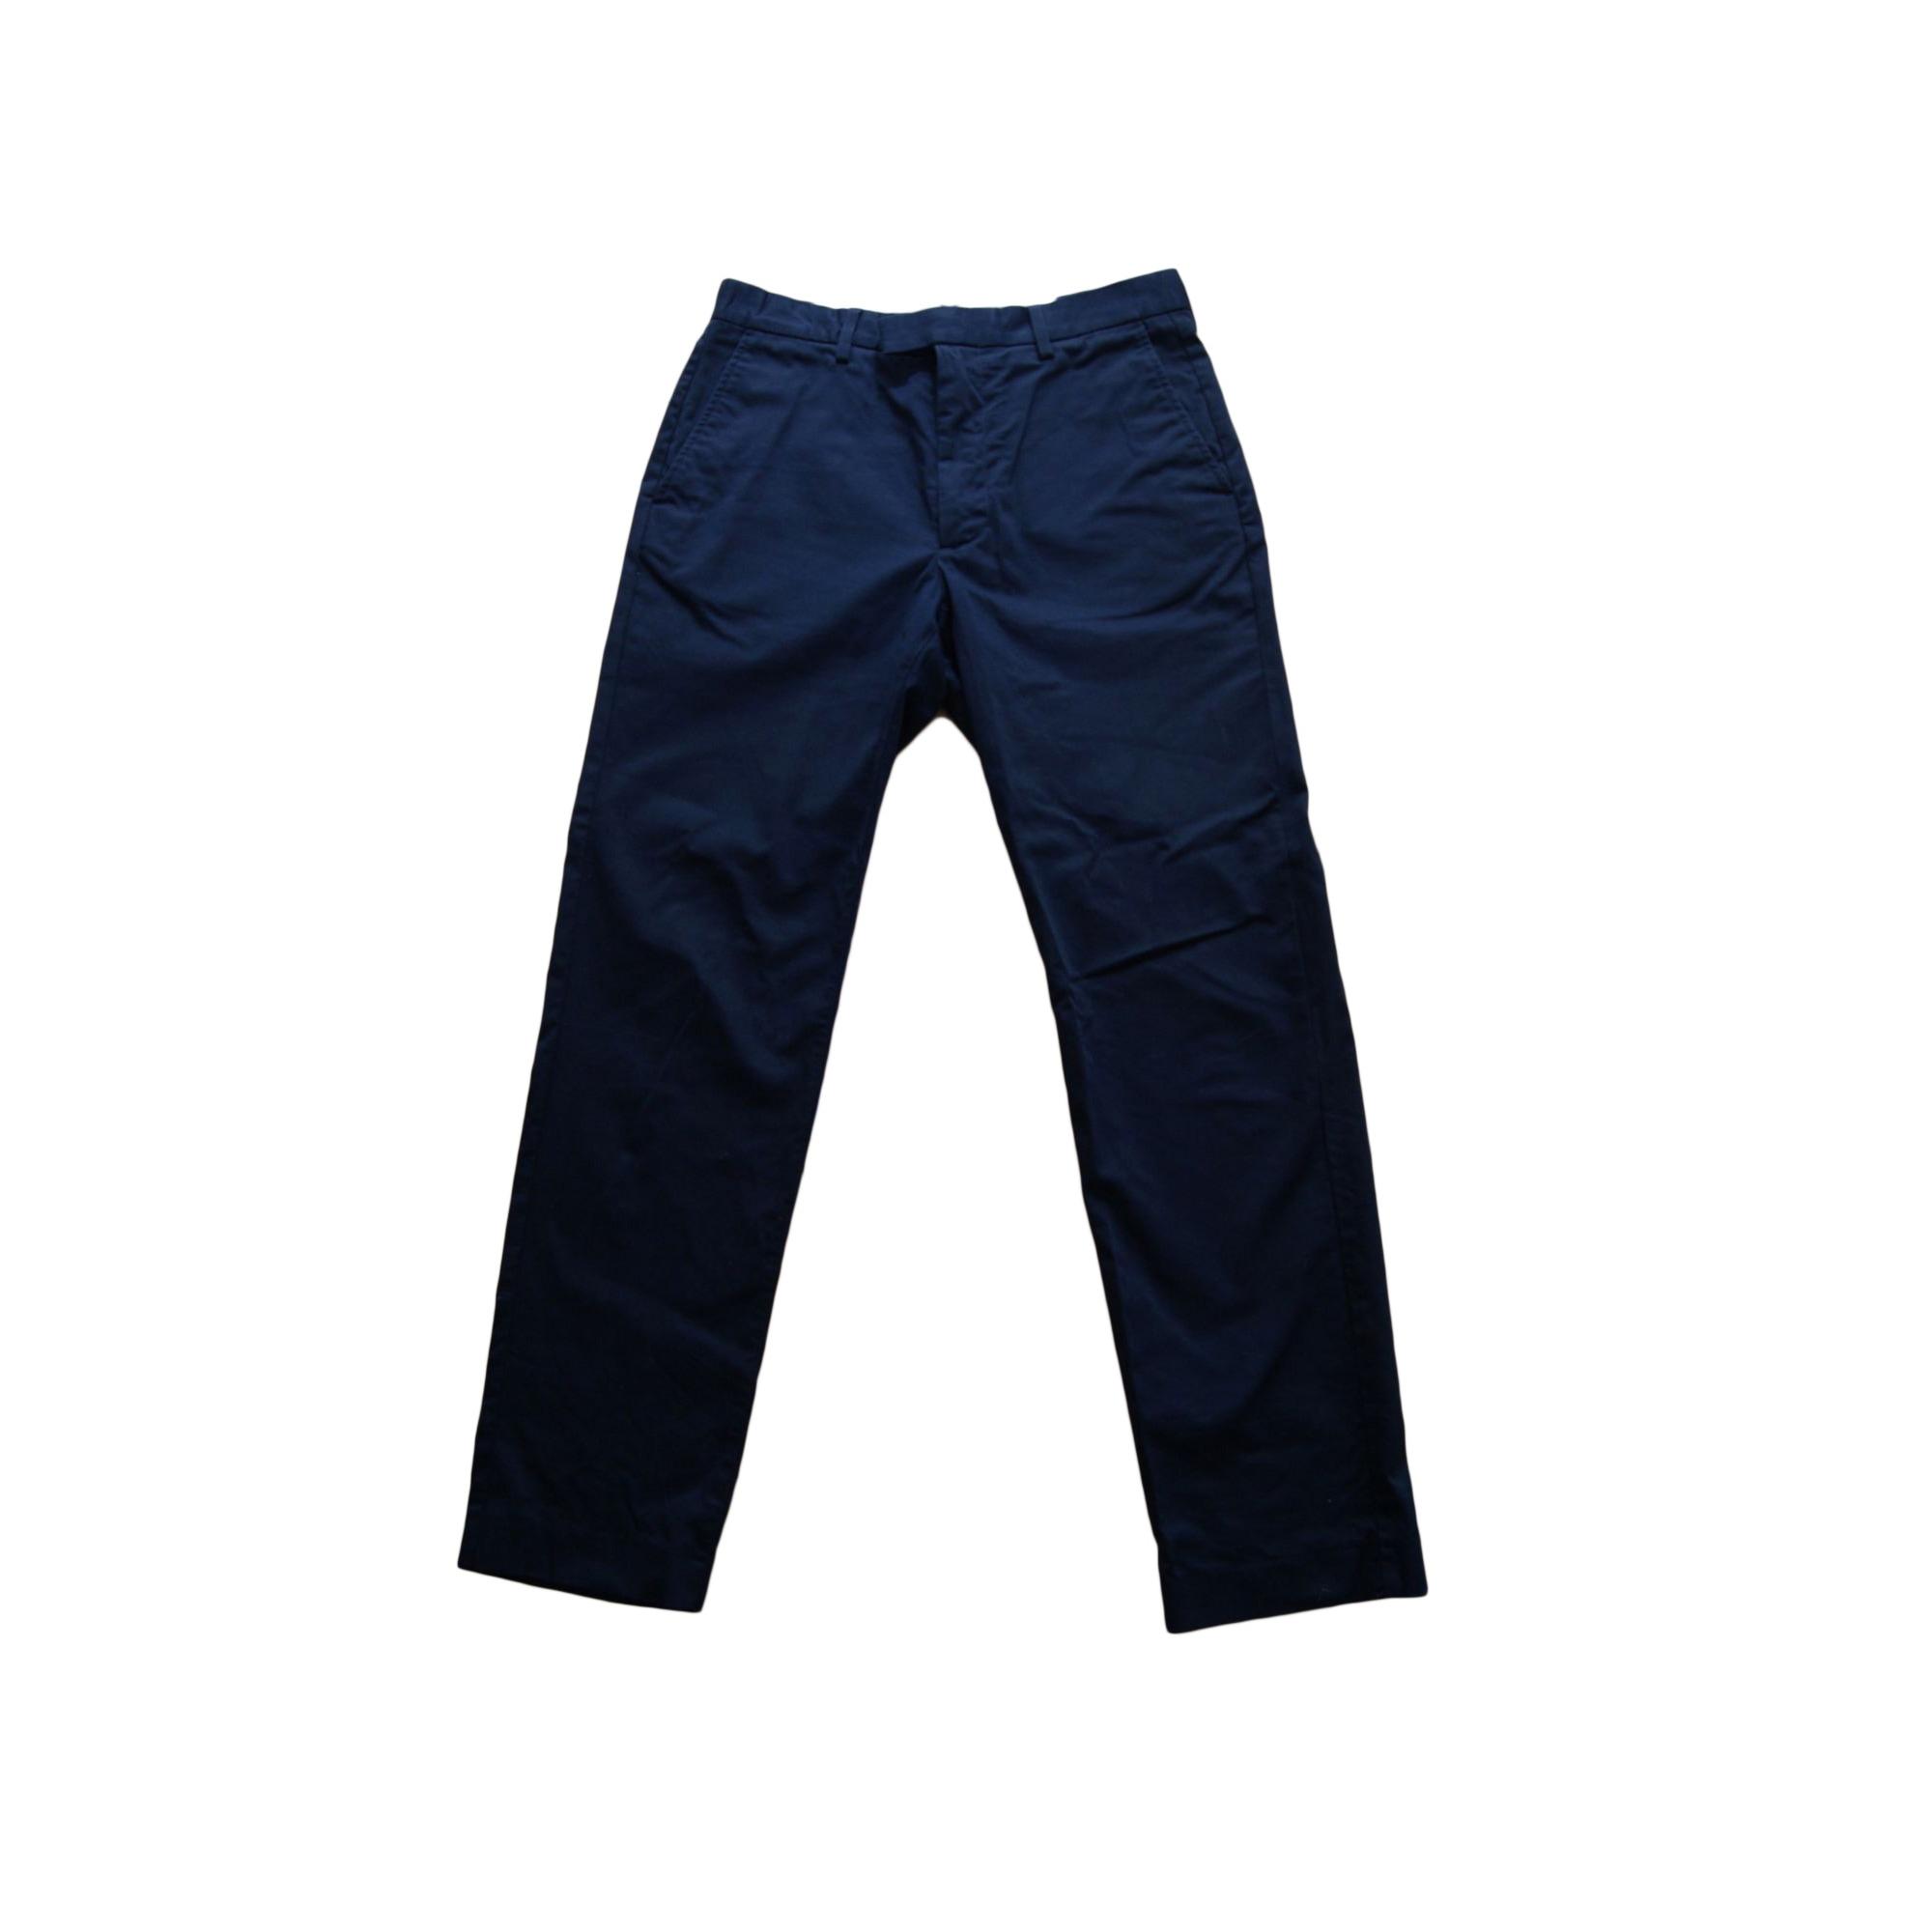 Pantalon droit ACNE Bleu, bleu marine, bleu turquoise